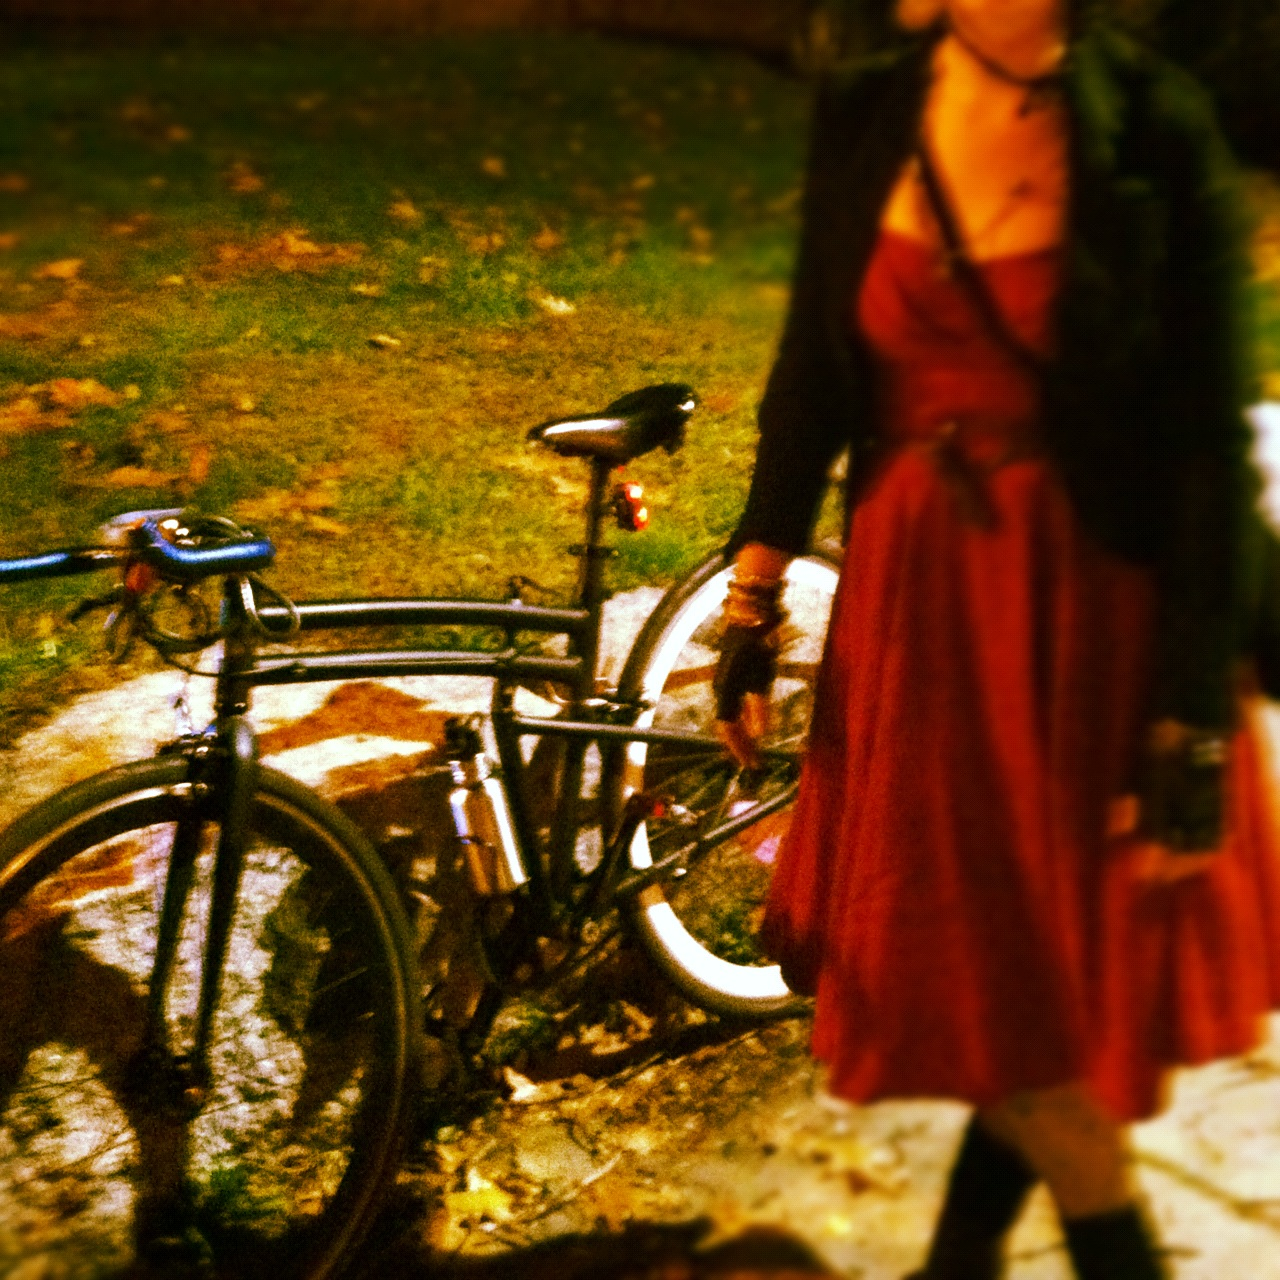 Folding Bike for Halloween